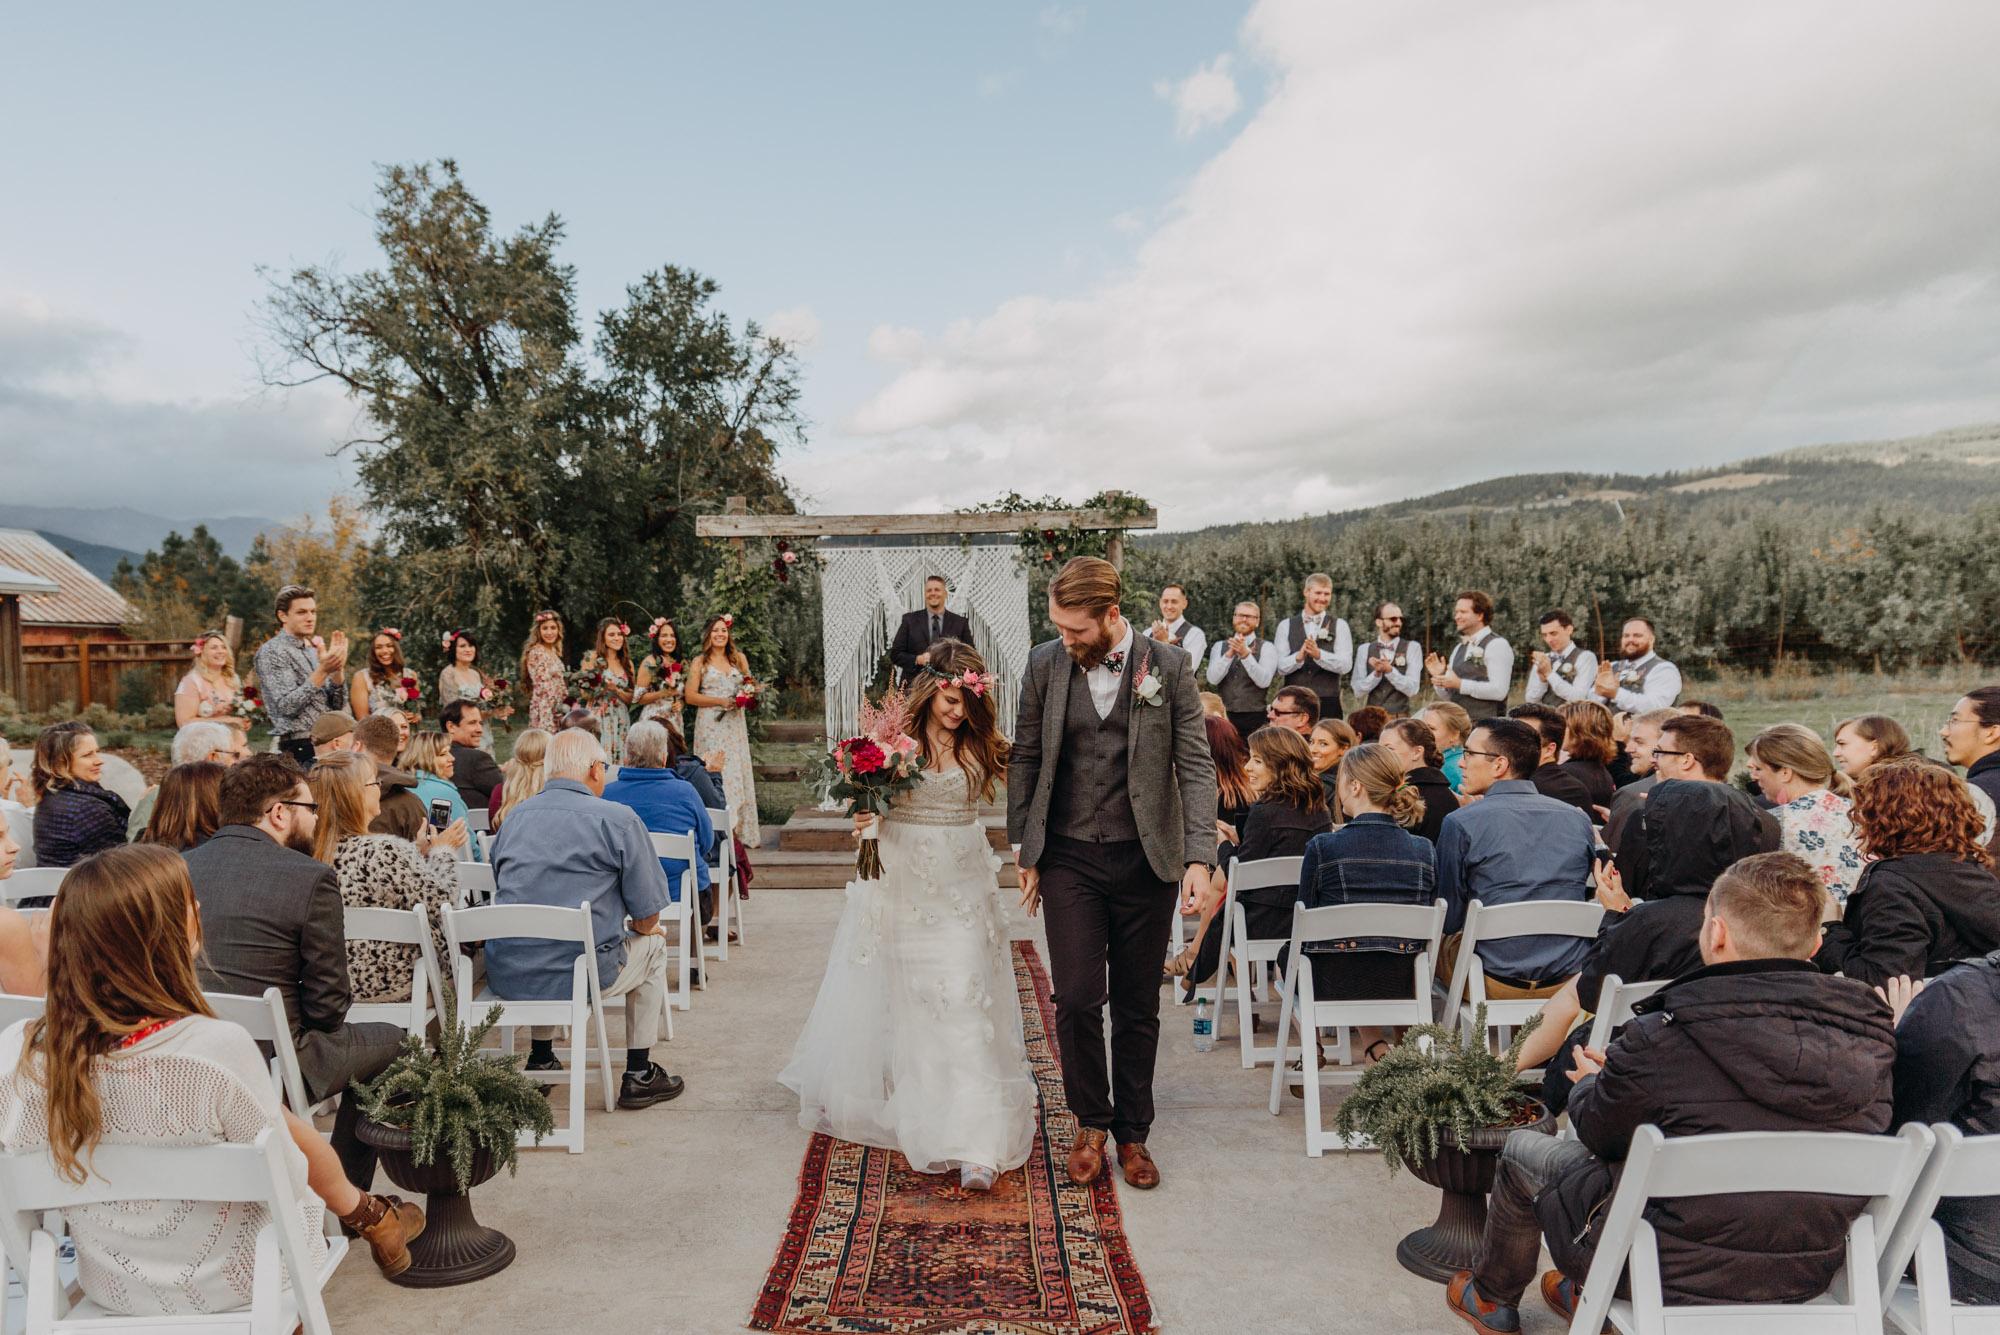 Outdoor-Summer-Ceremony-Washington-Wedding-Rainbow-5446.jpg